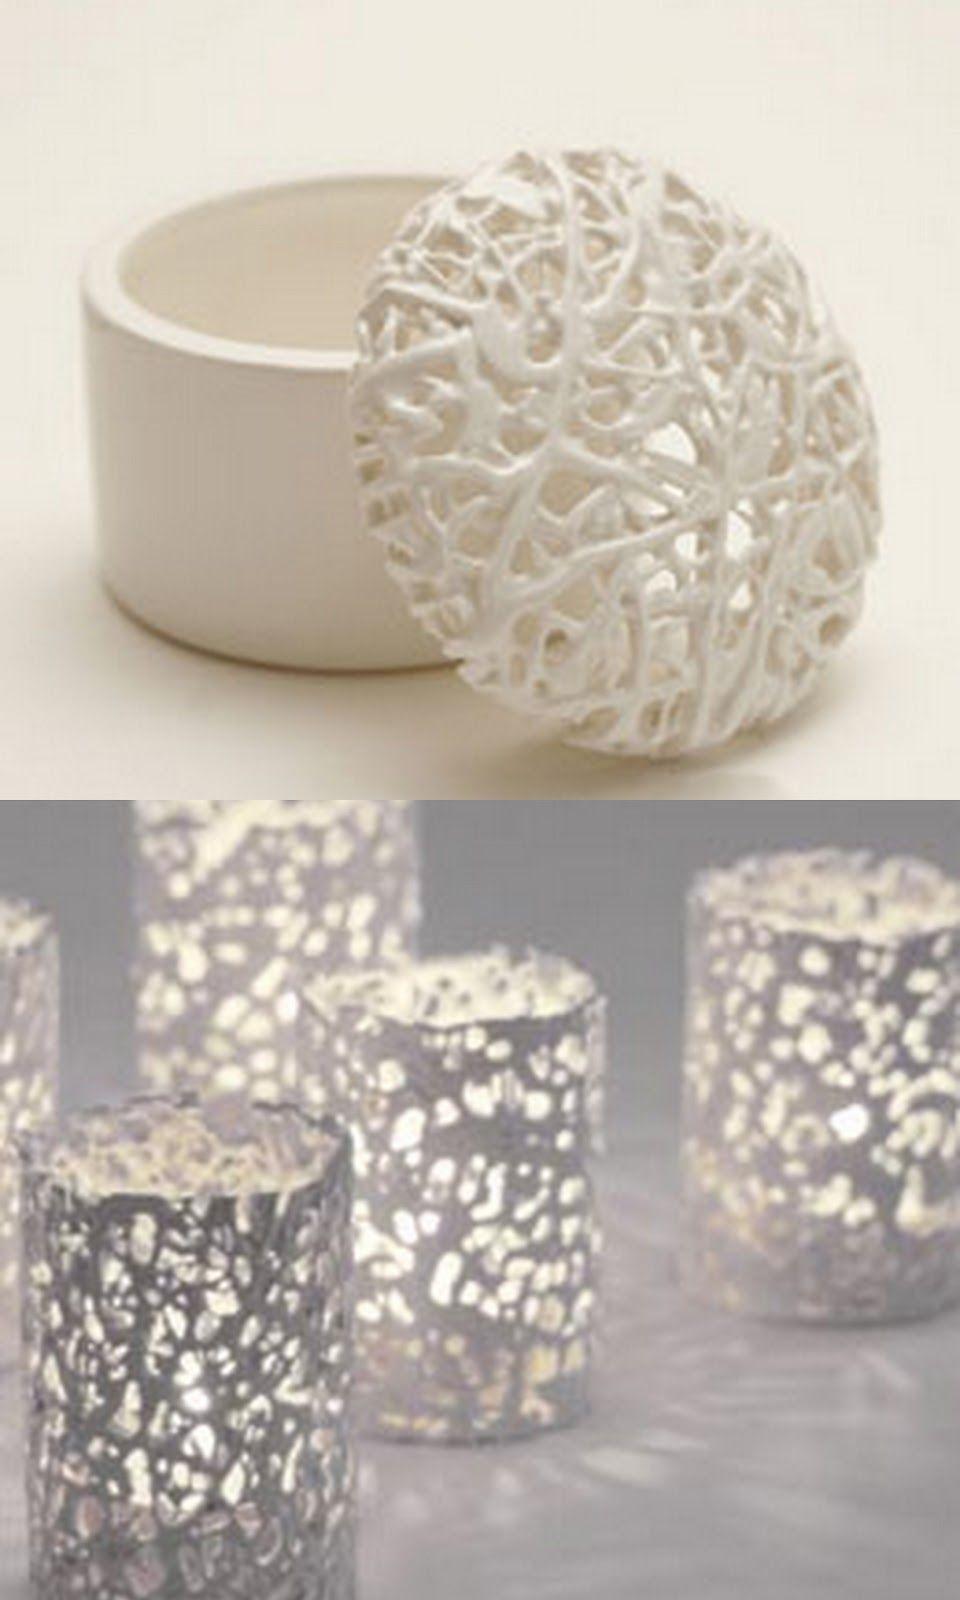 timea sido kleine m dchen pinterest keramik. Black Bedroom Furniture Sets. Home Design Ideas